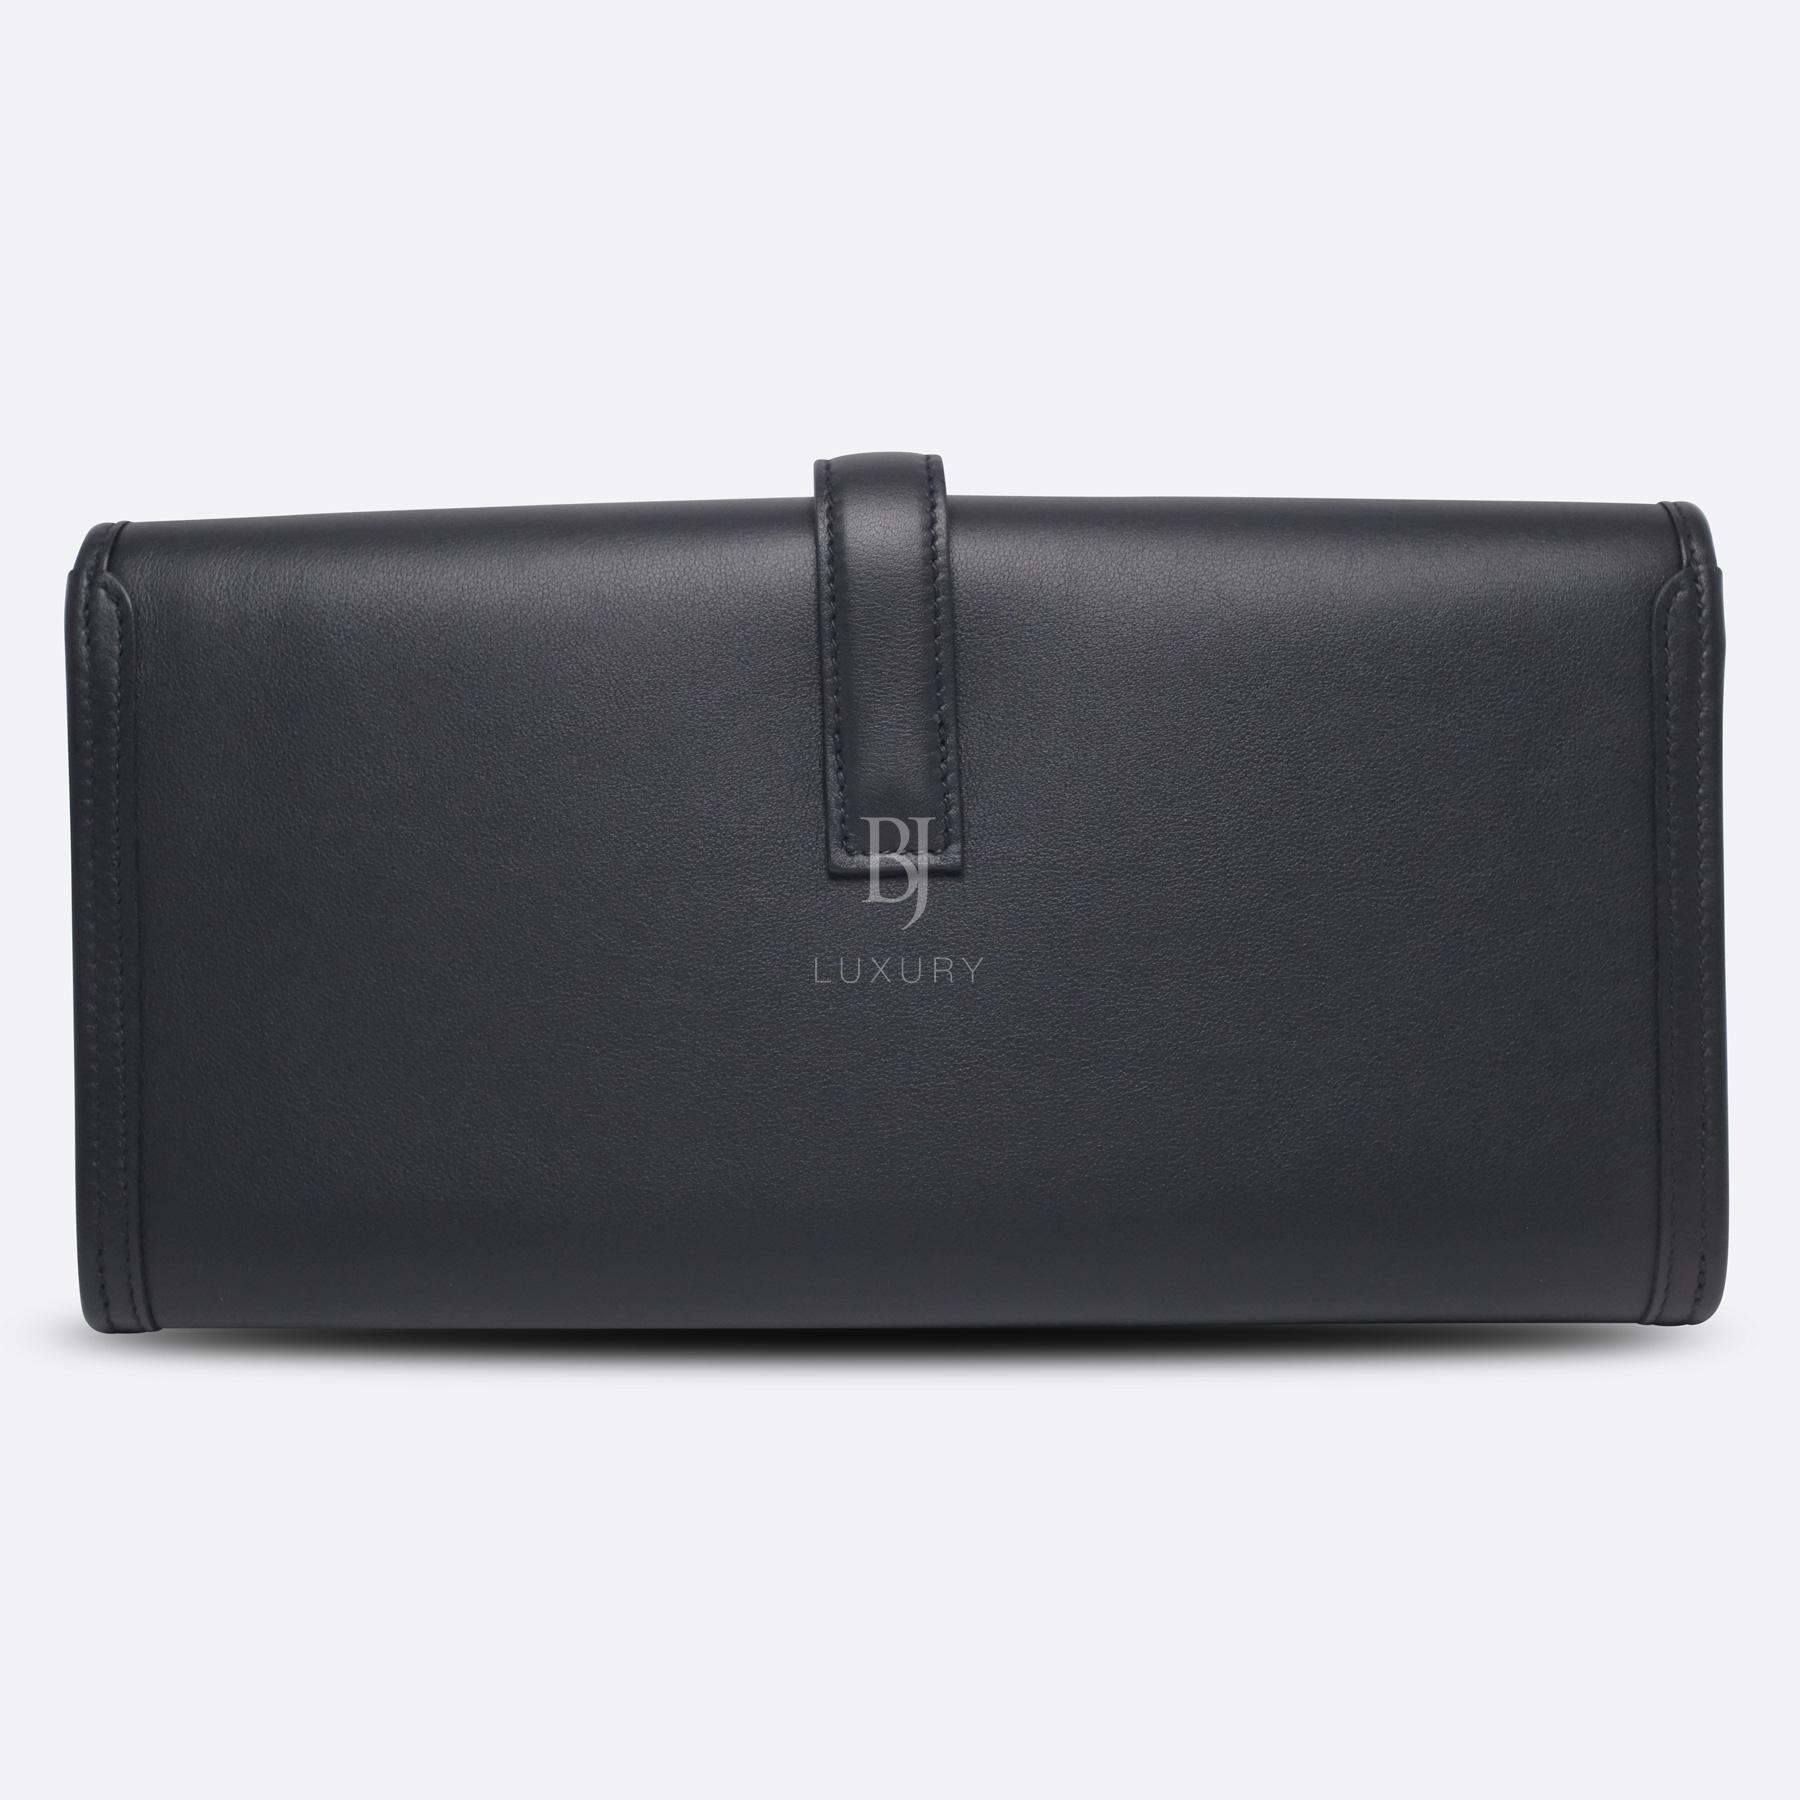 Hermes Jige 29 Black Swift BJ Luxury 2.jpg